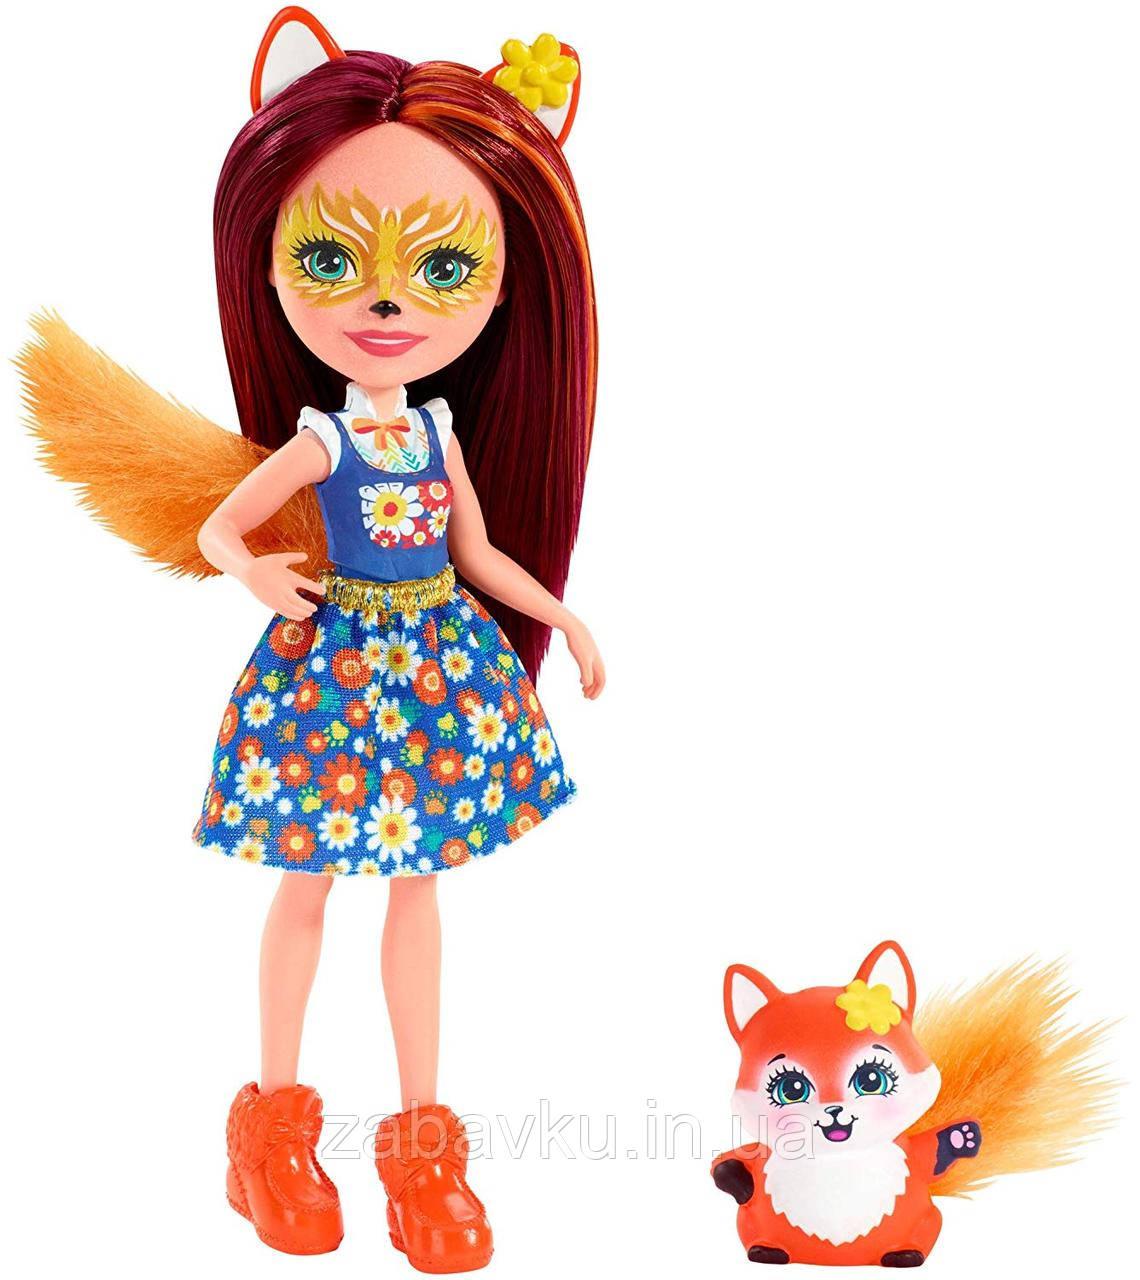 Лисичка Фелісіті і Флік Енчантімалс, Enchantimals Felicity Fox Doll